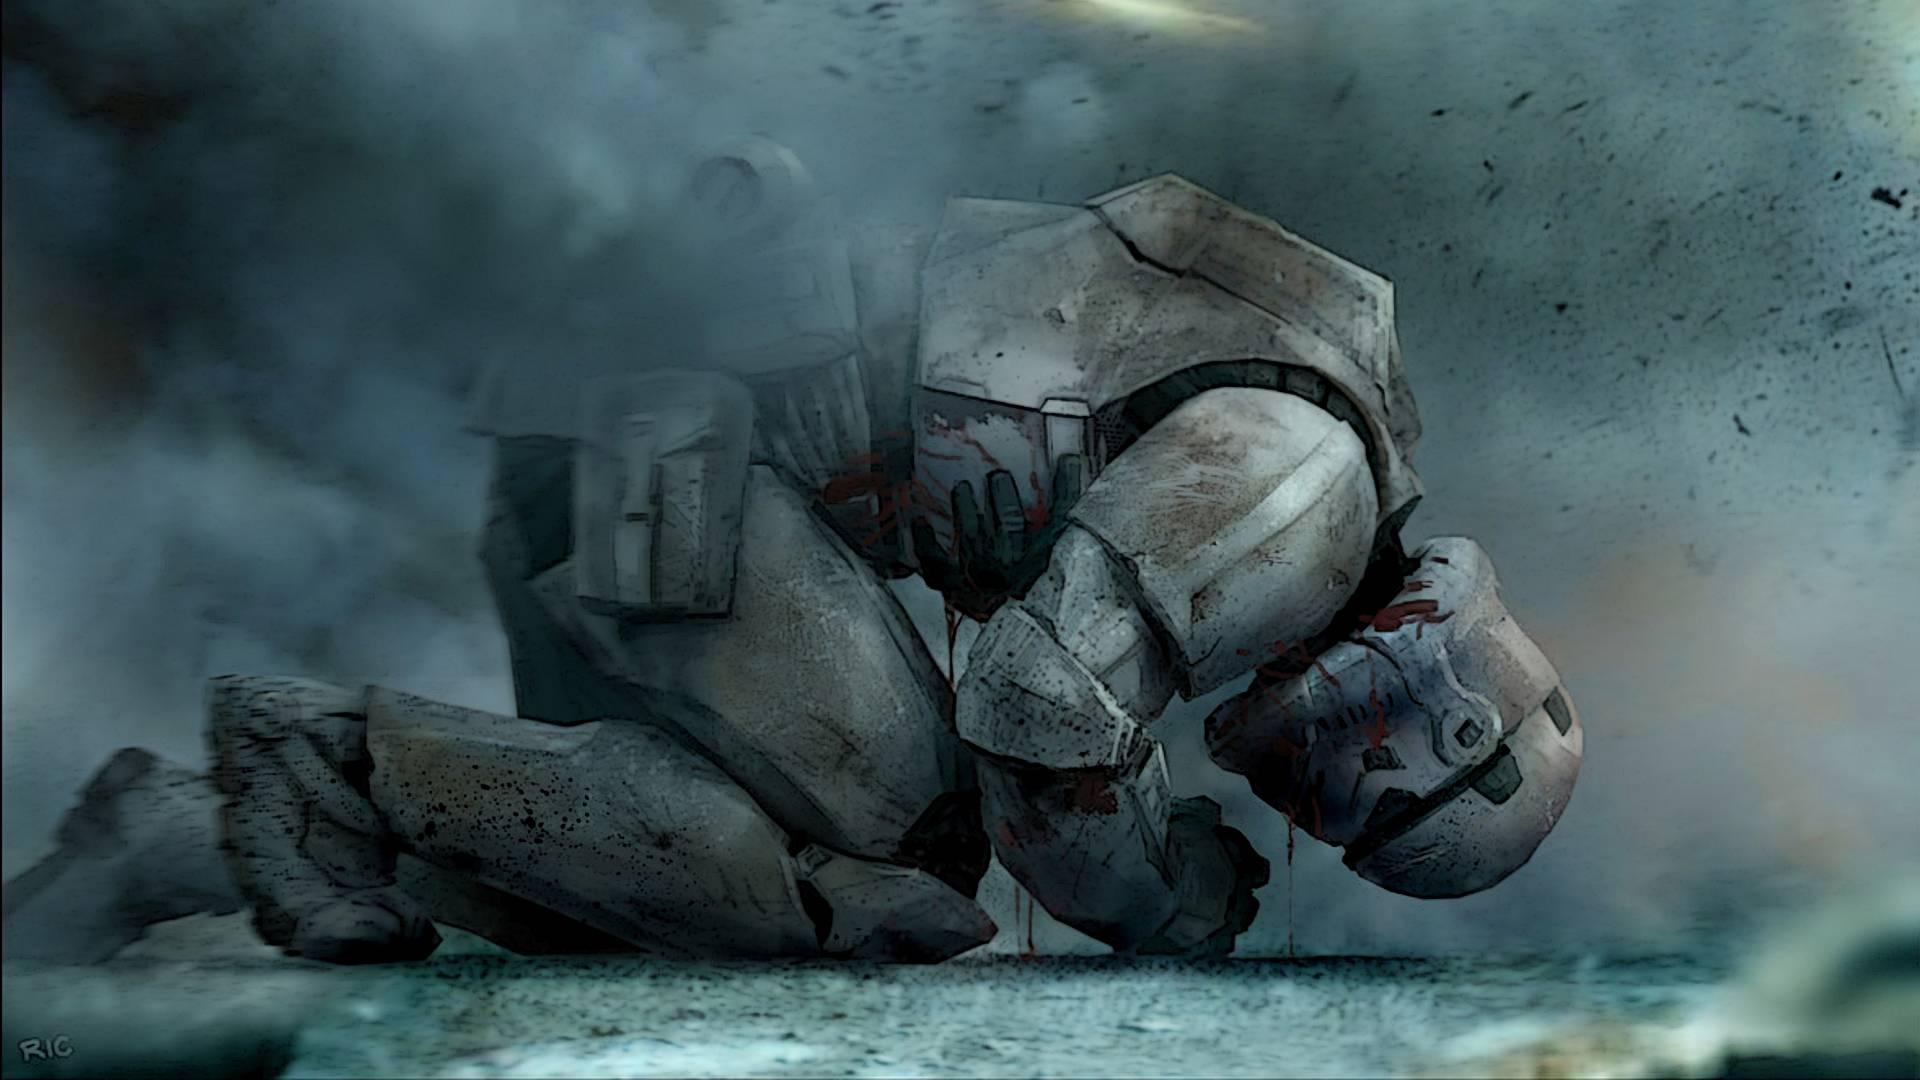 Stormtrooper Star Wars Wallpapers Wallpaper Cave